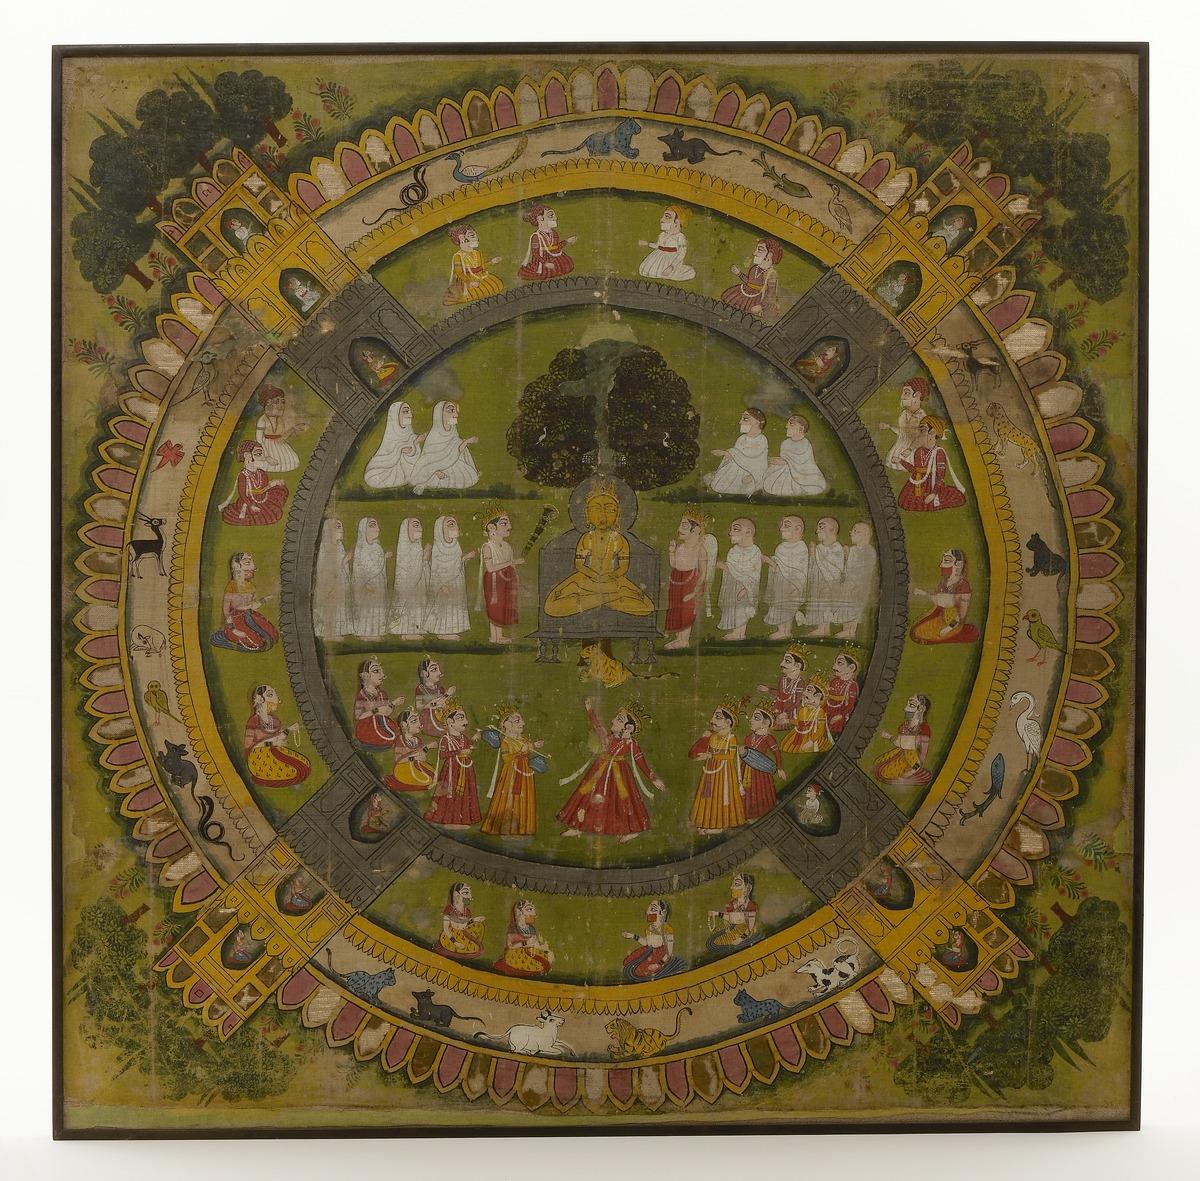 Samovasarana, prediking van Mahavira